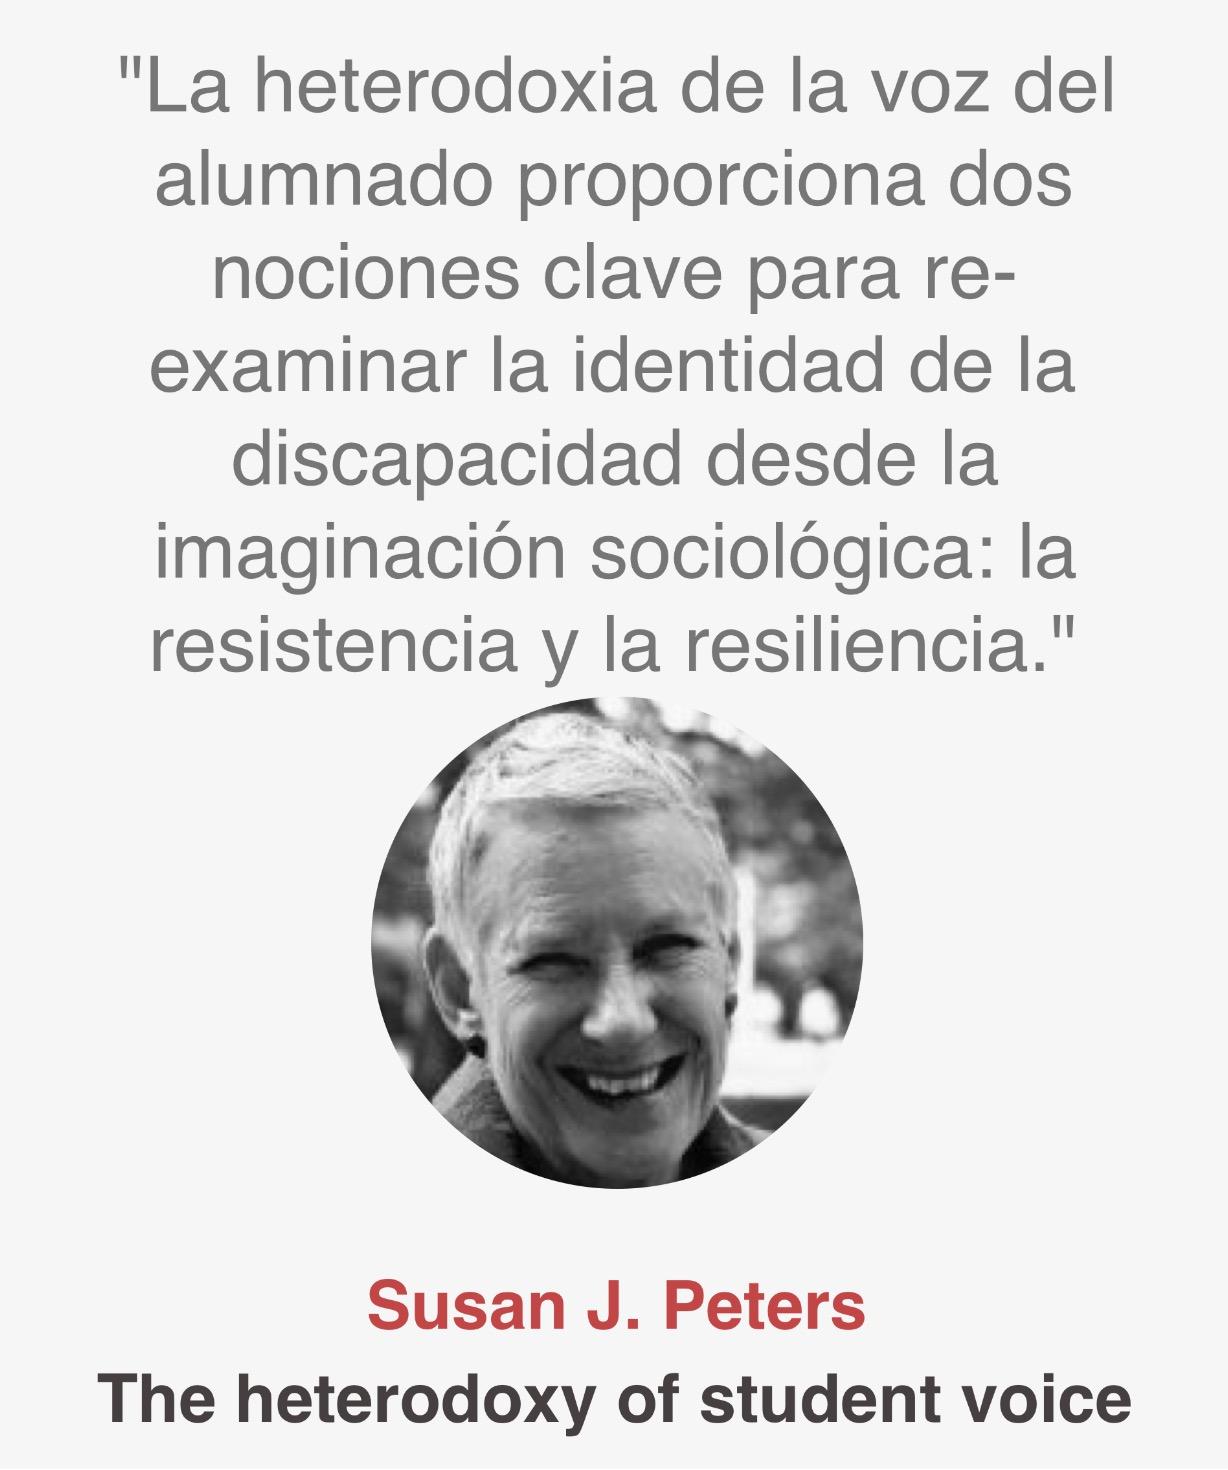 Cita Peters